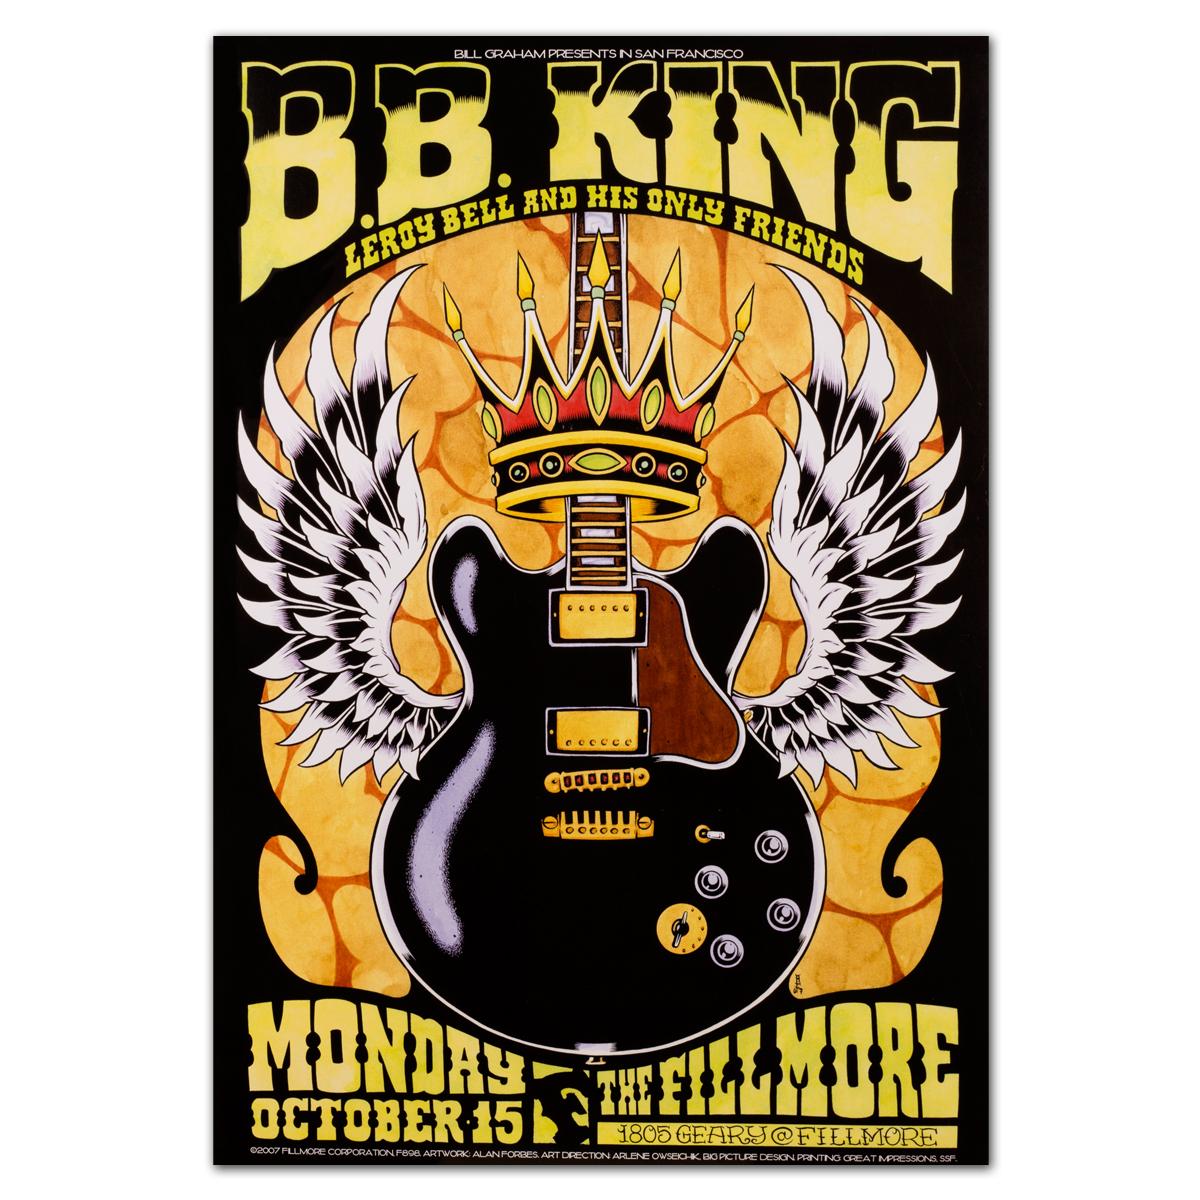 Fillmore - BB King 10/15/2007 Poster